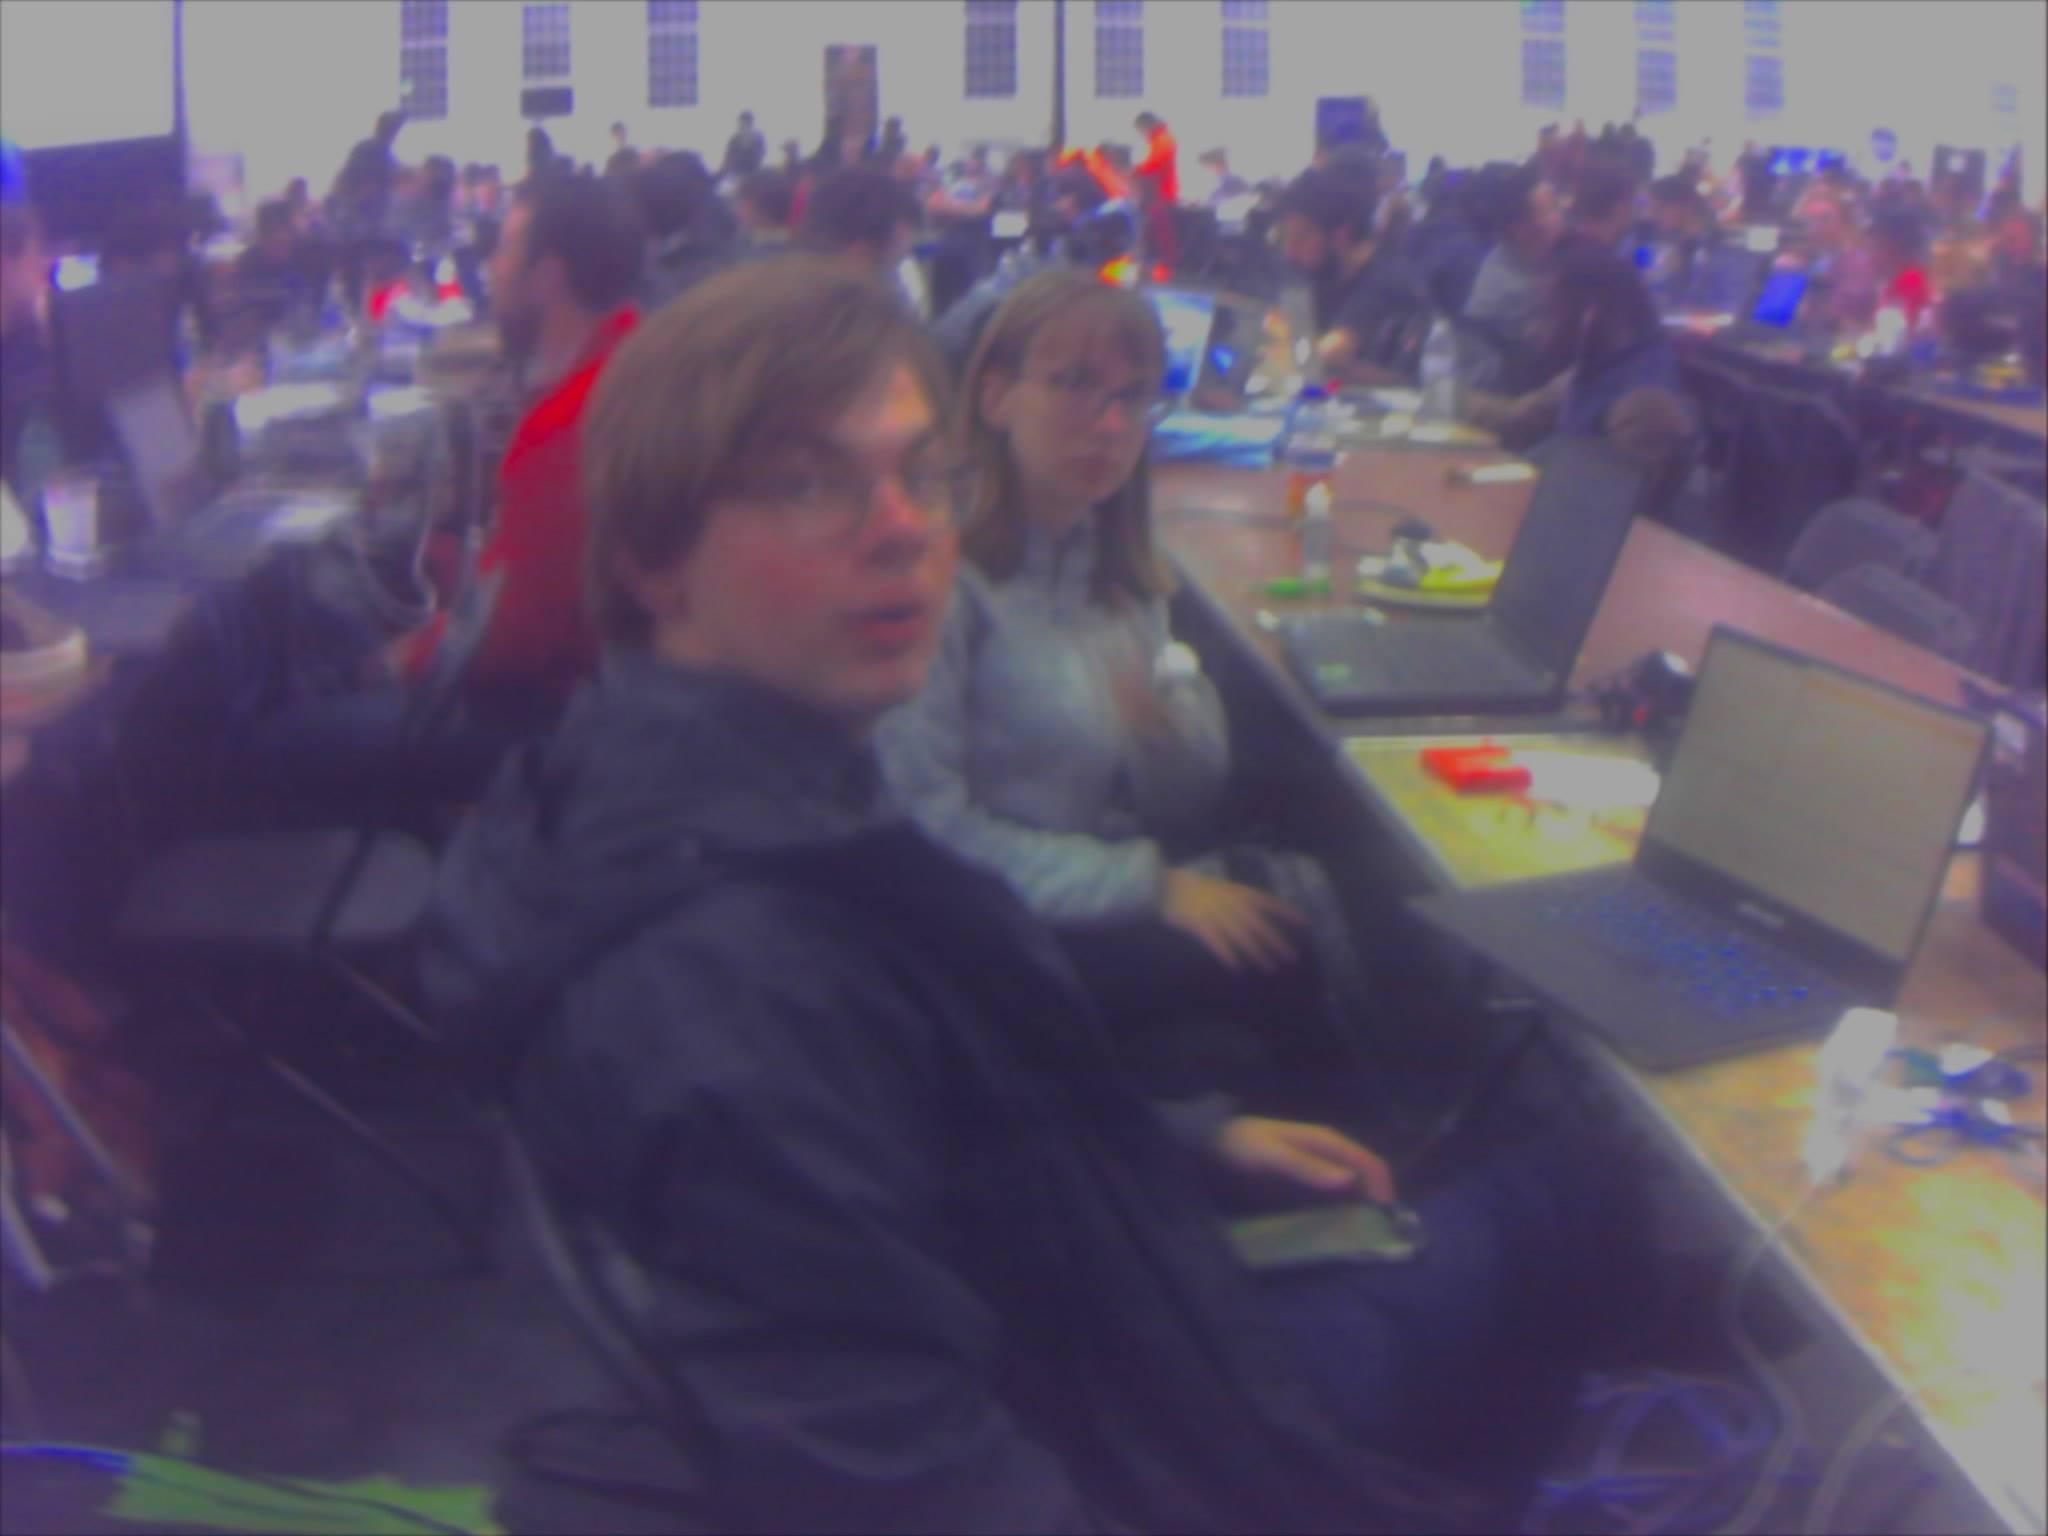 Photo 1 - fellow hackers